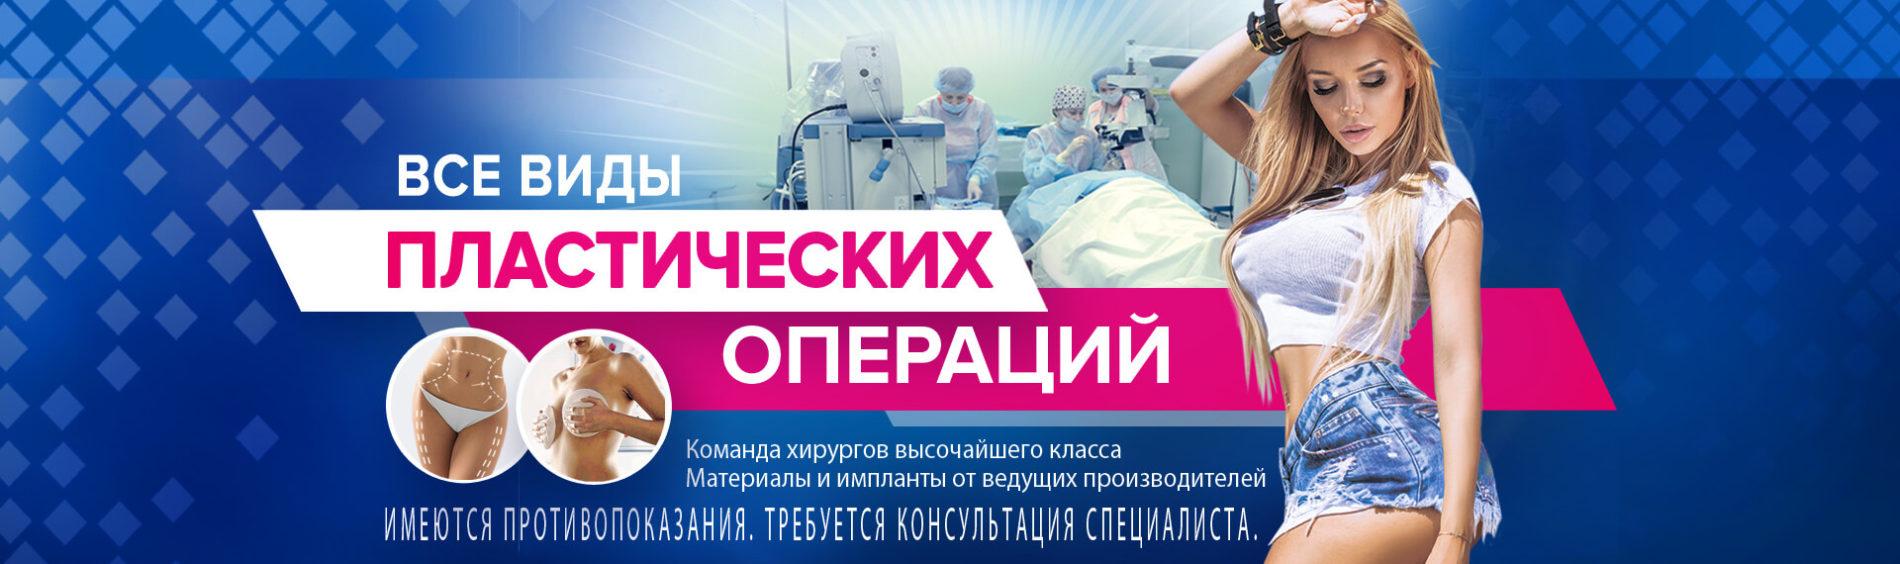 Косметология в Орехово-Зуево